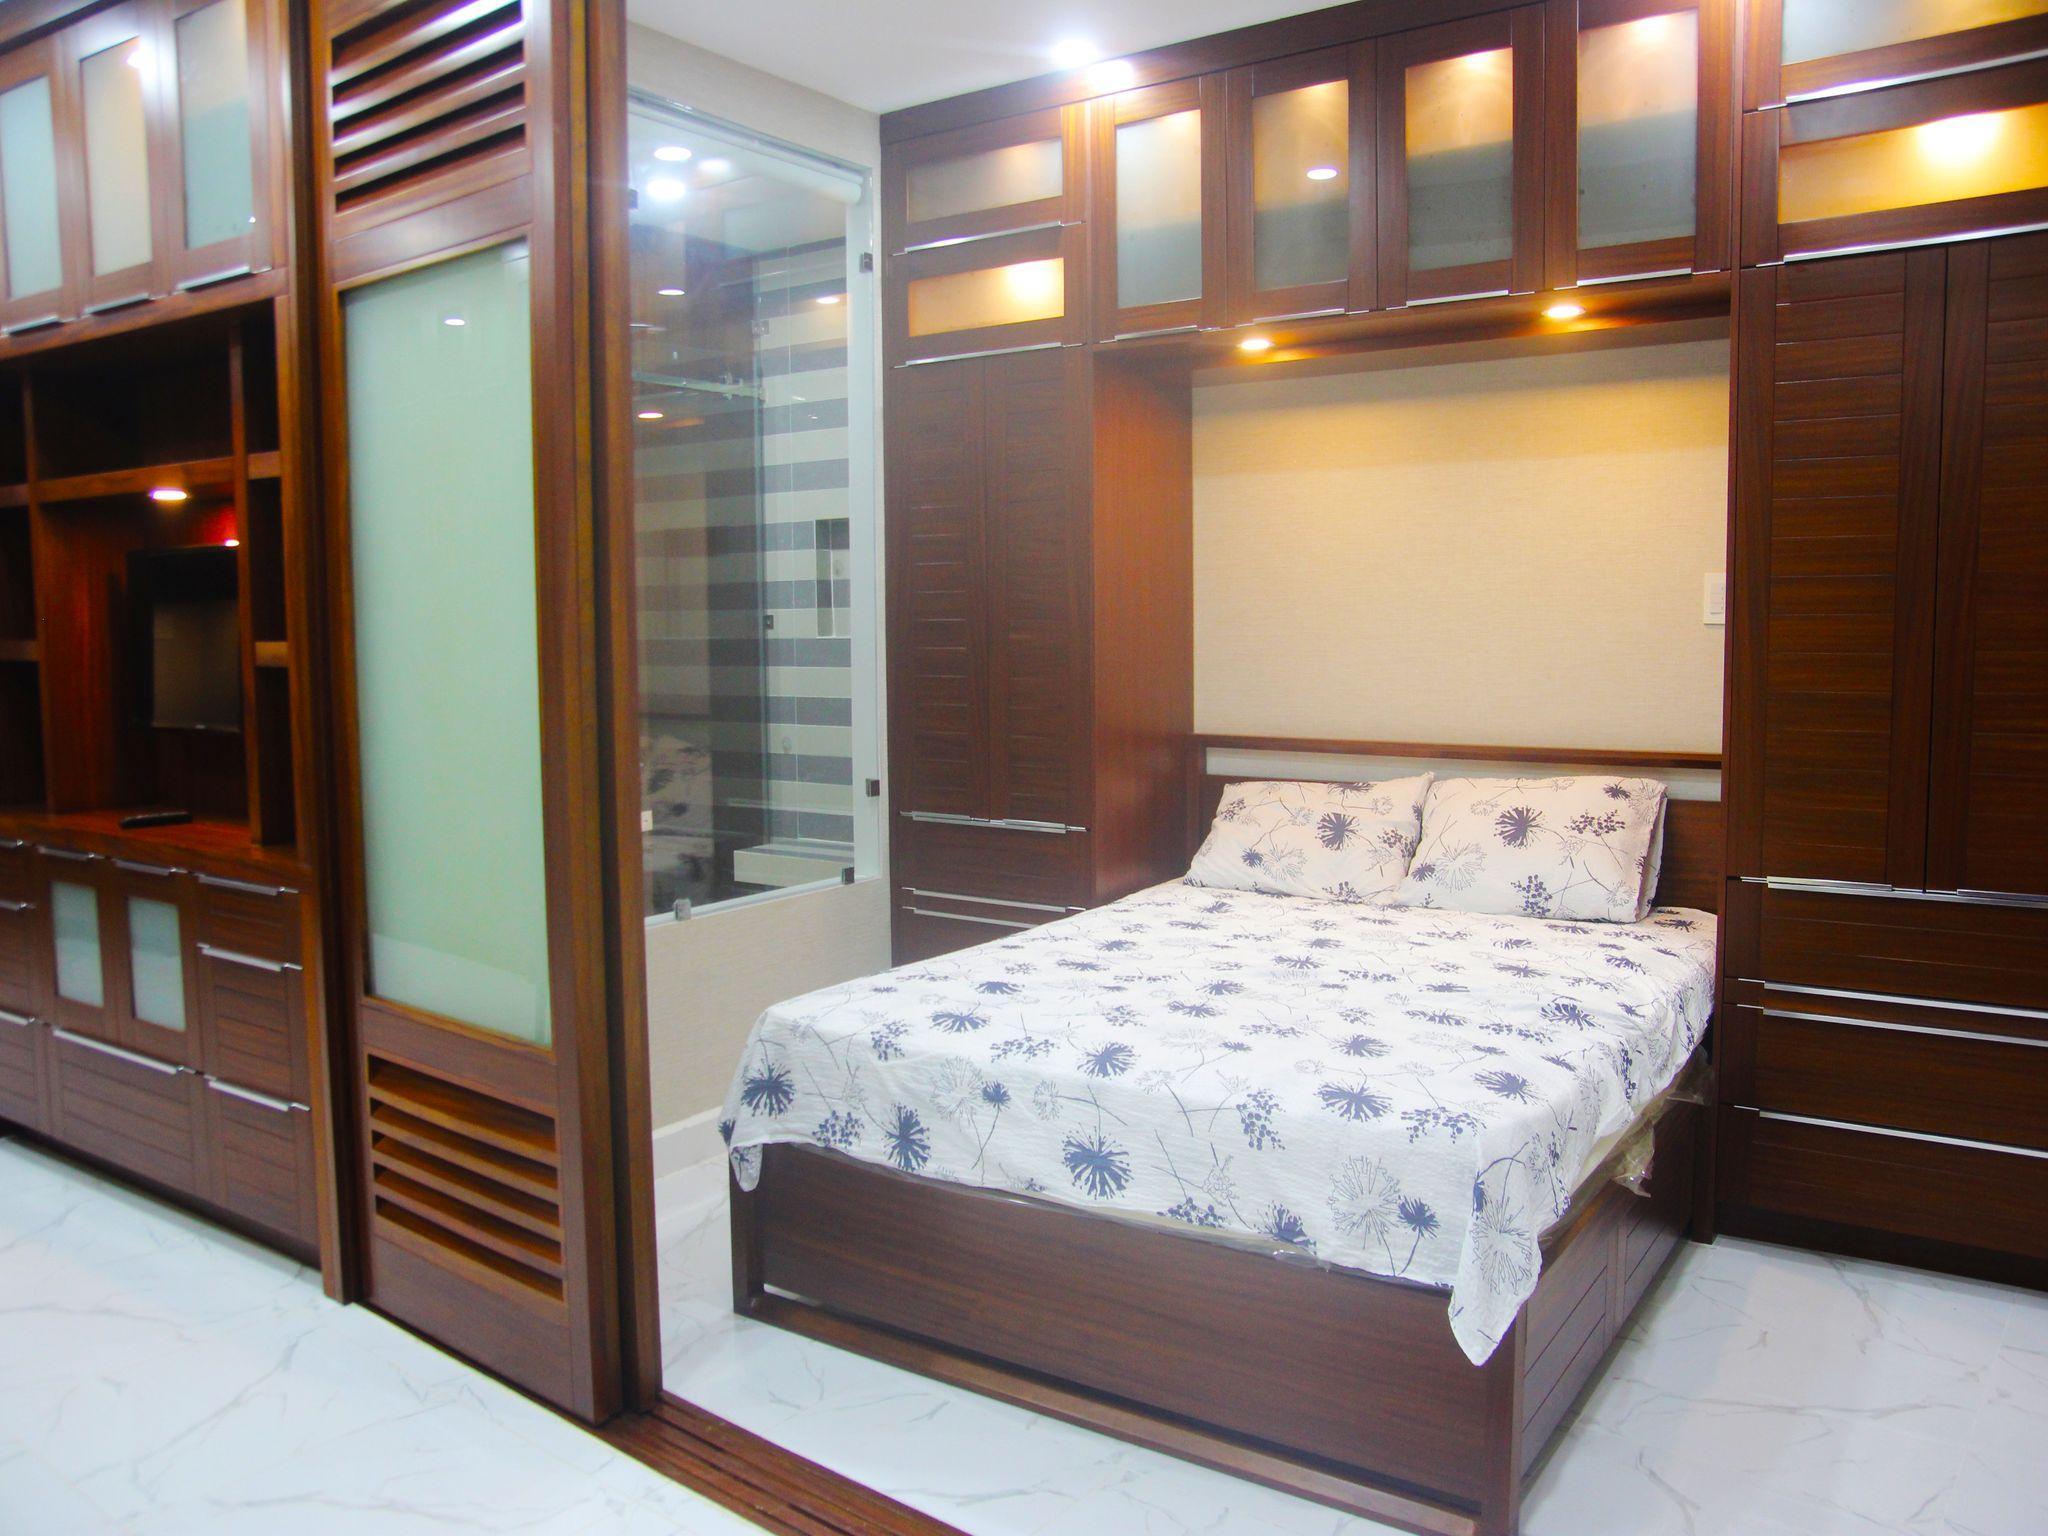 TT10.11 Thuy Tien Sea View Apartment